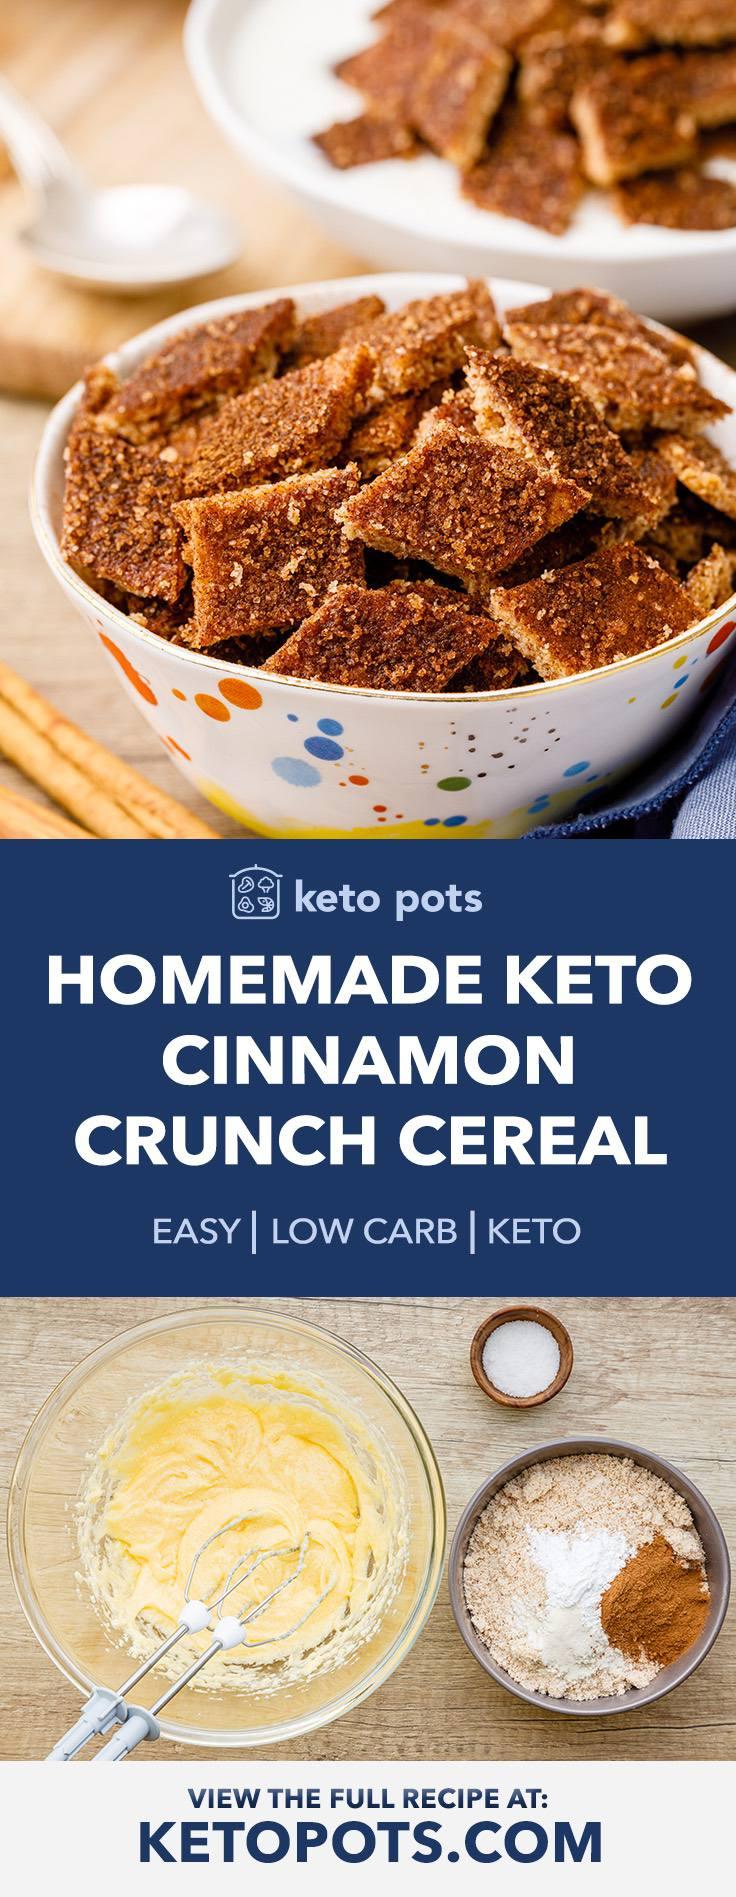 Crave-worthy Keto Cinnamon Toast Crunch Cereal Recipe